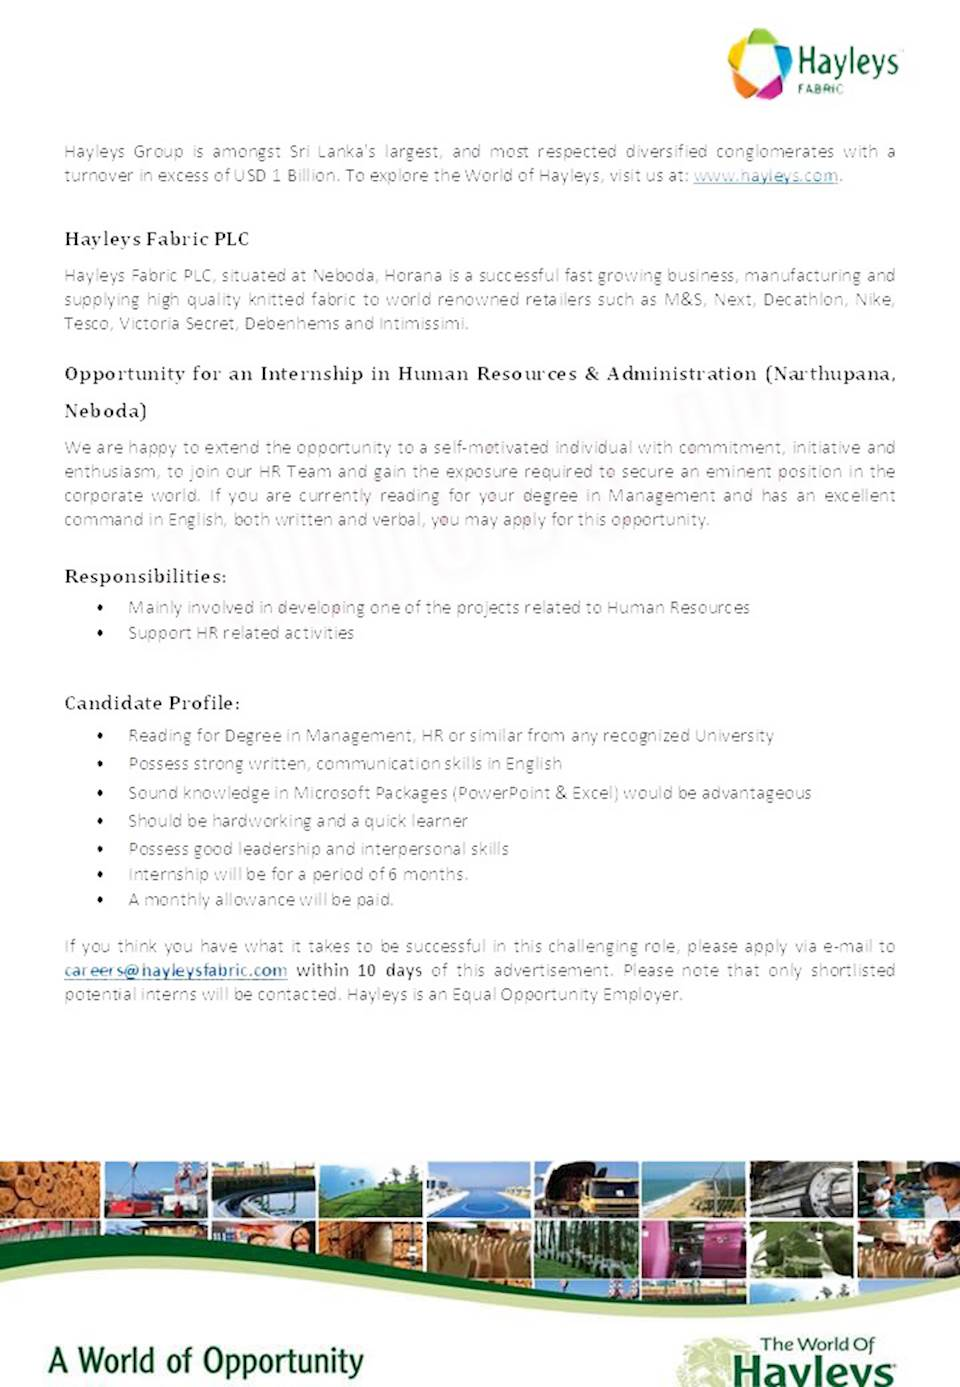 Internship in Human Resources & Administration